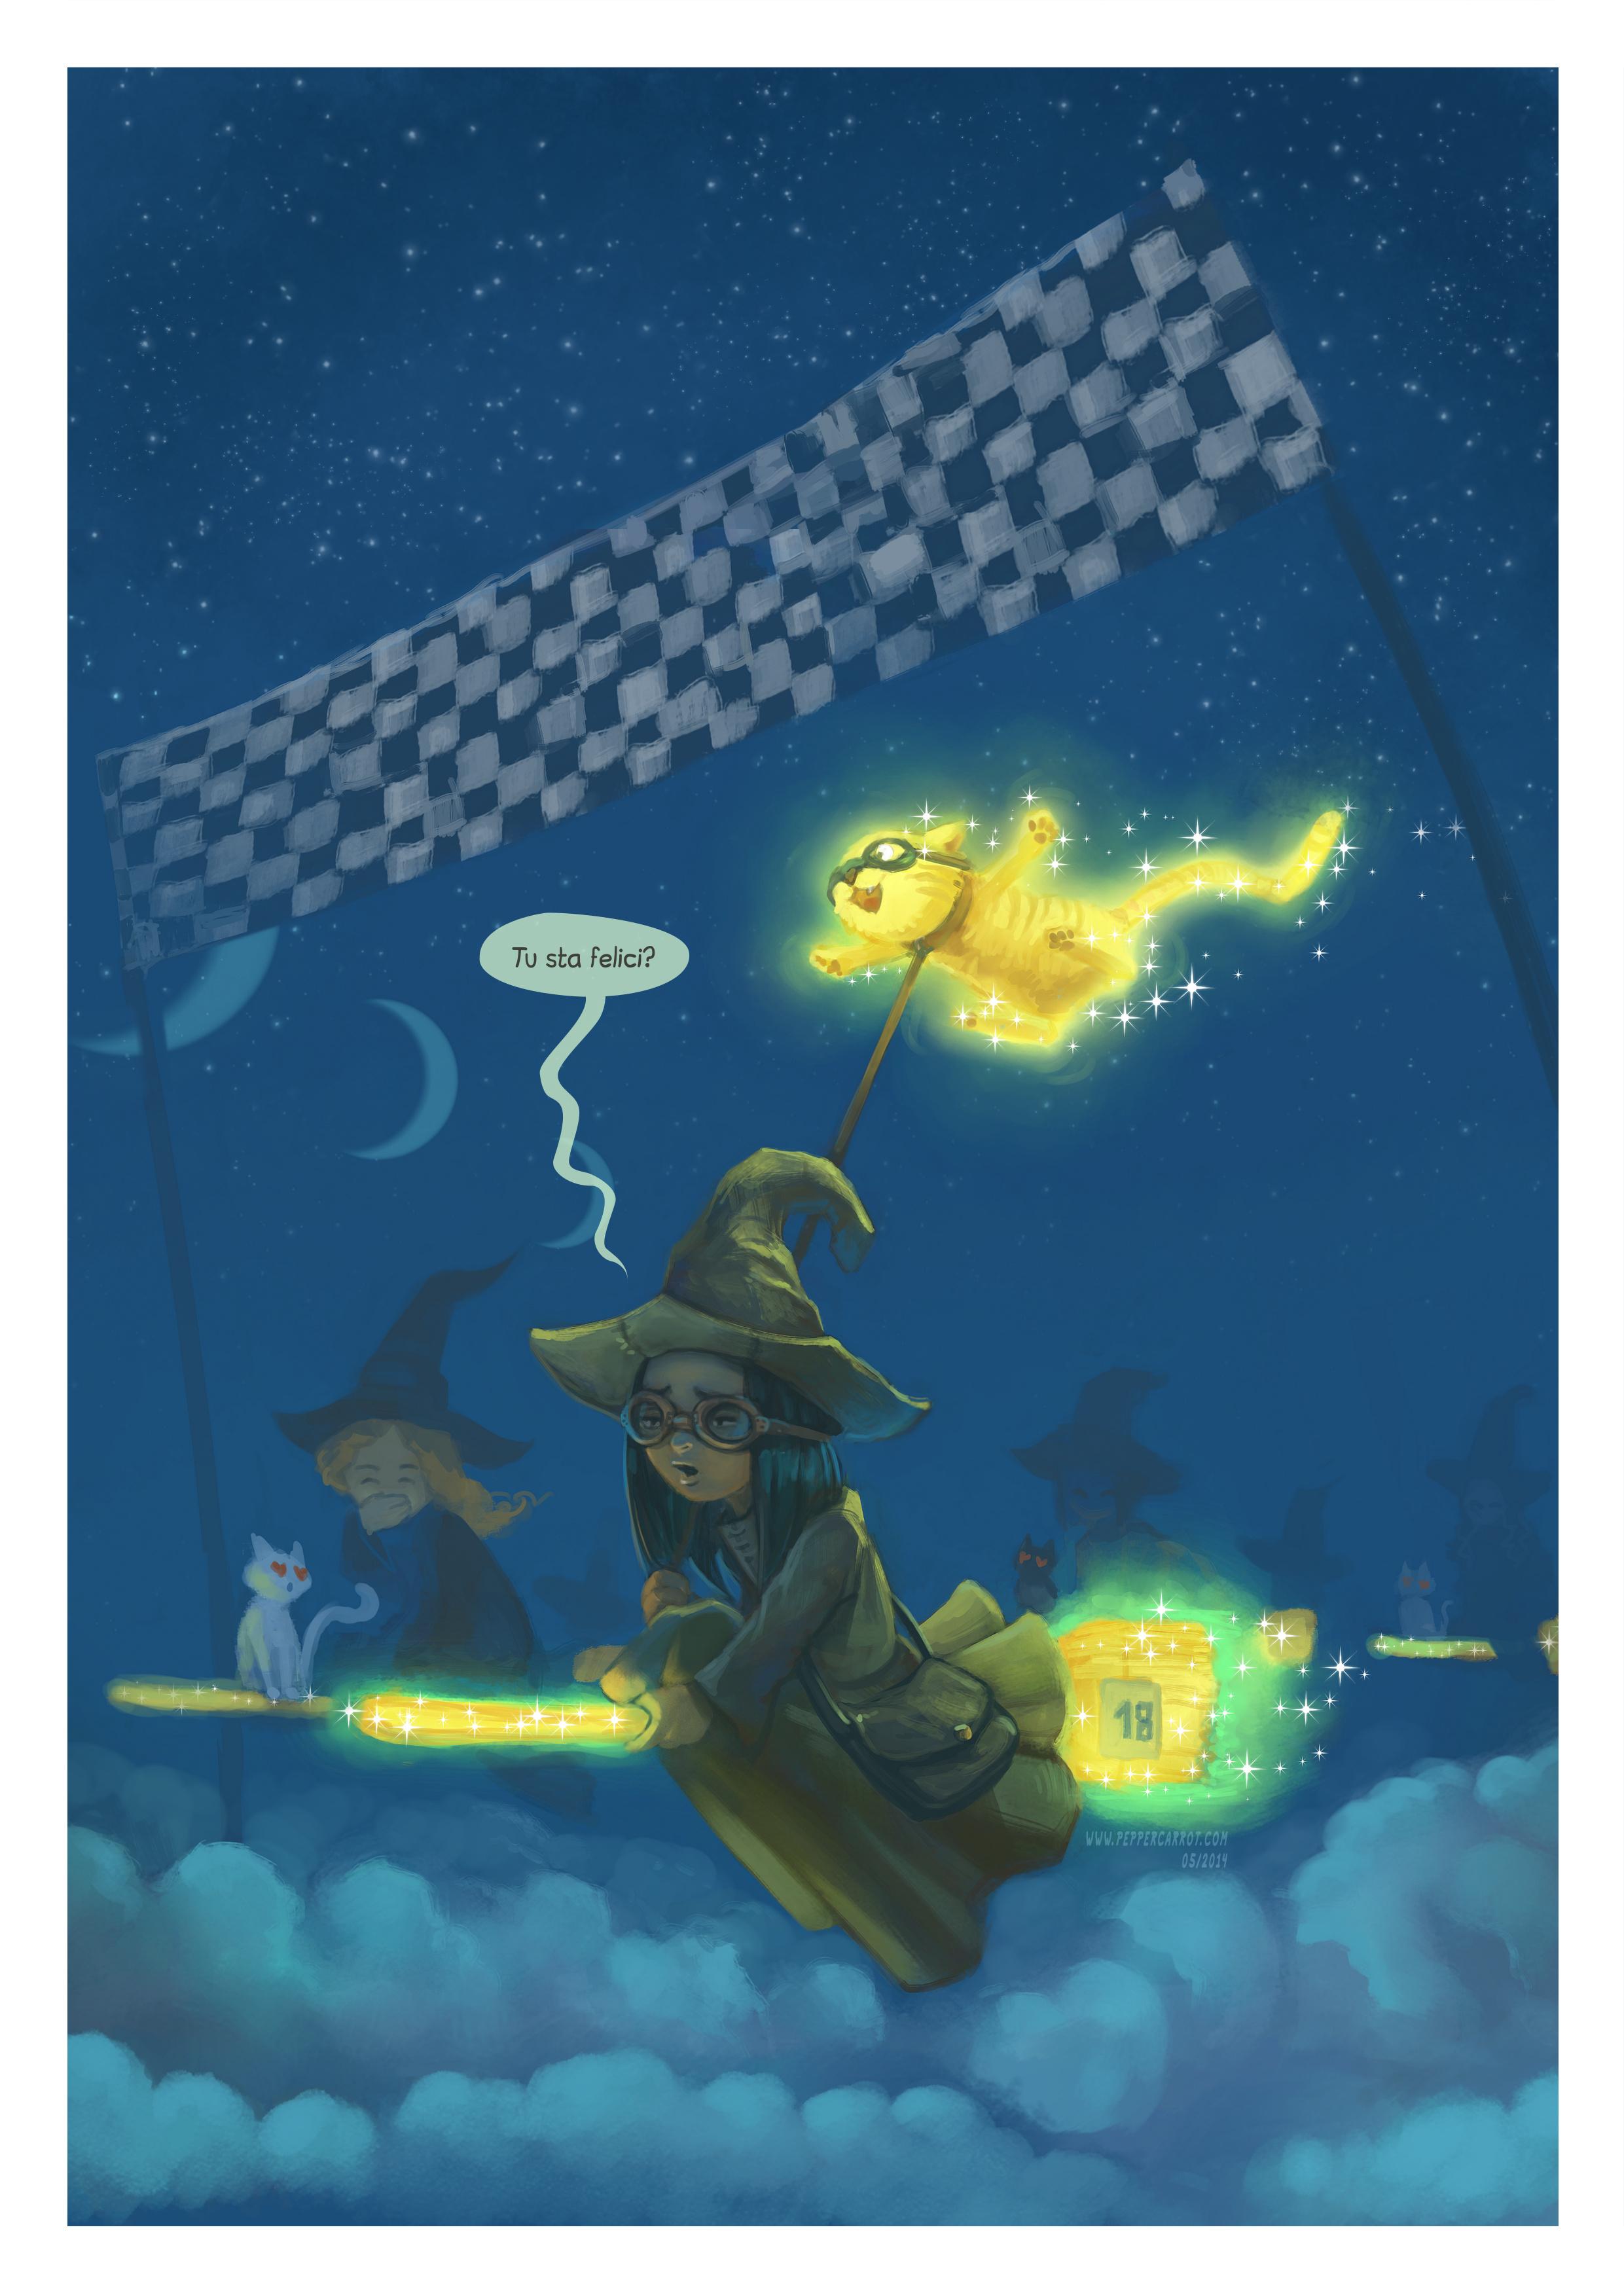 Episode 1: Li Potion de Volada, Page 3